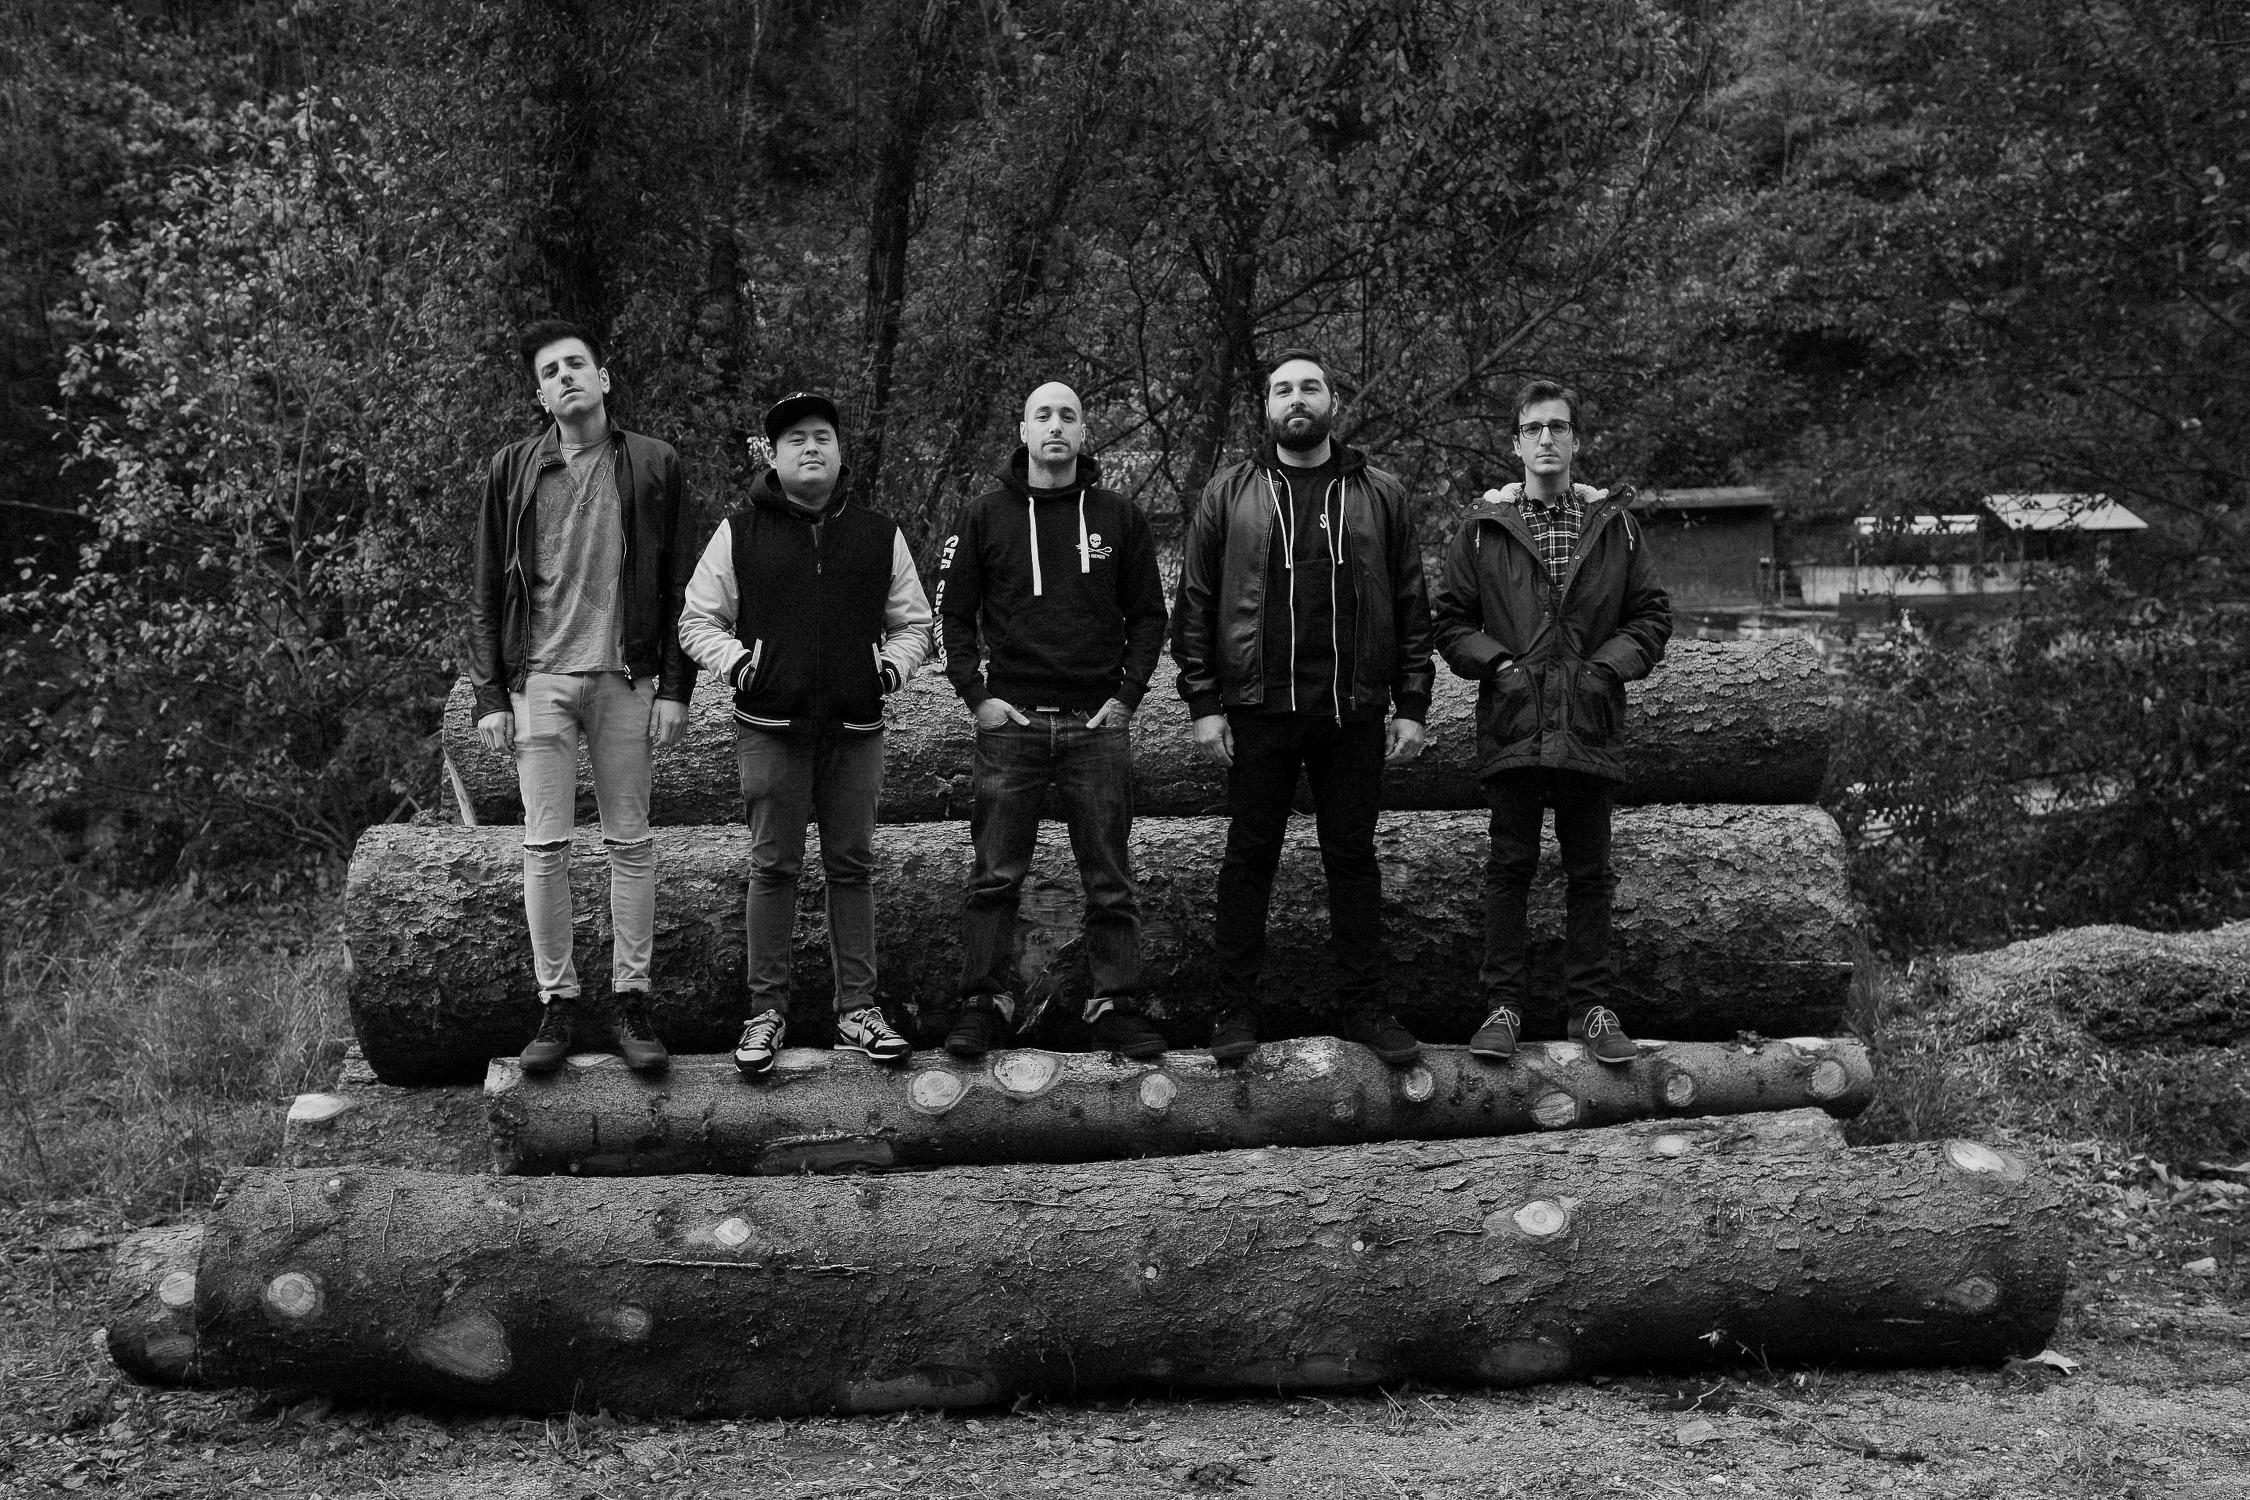 lifestyle-serenamorandi-band